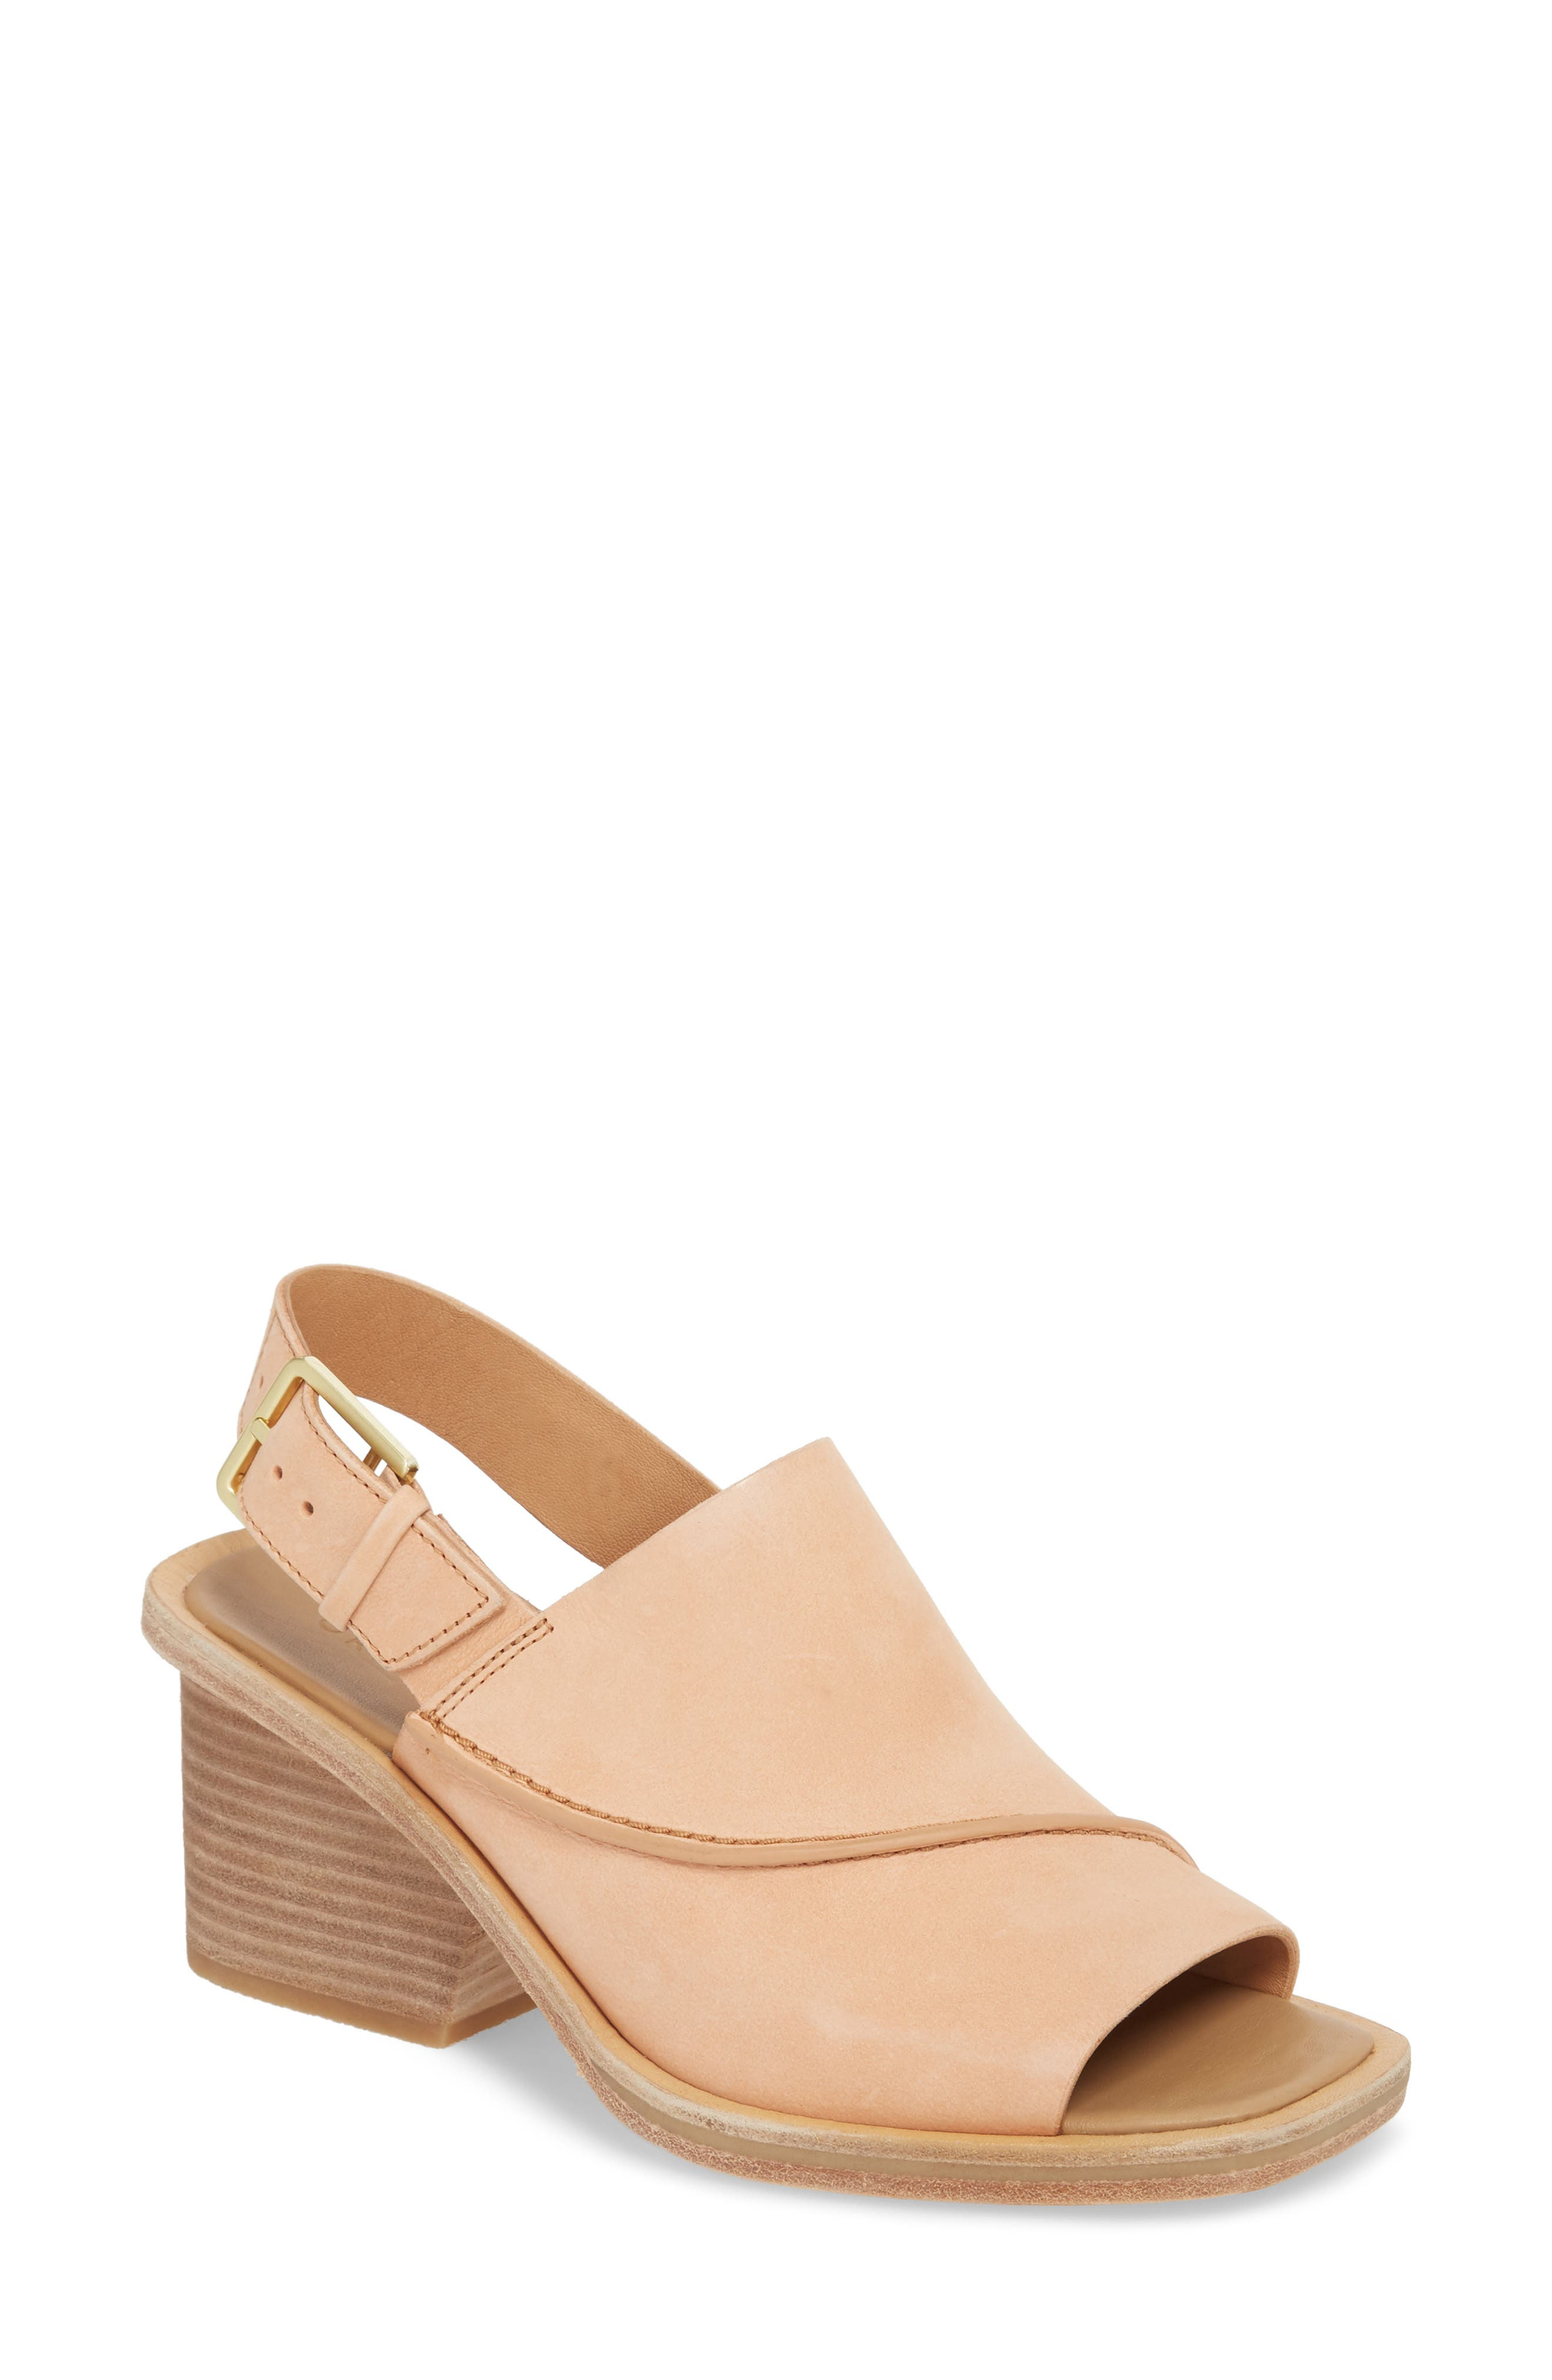 Clarks Bermudan Block Heel Sandal (Women)